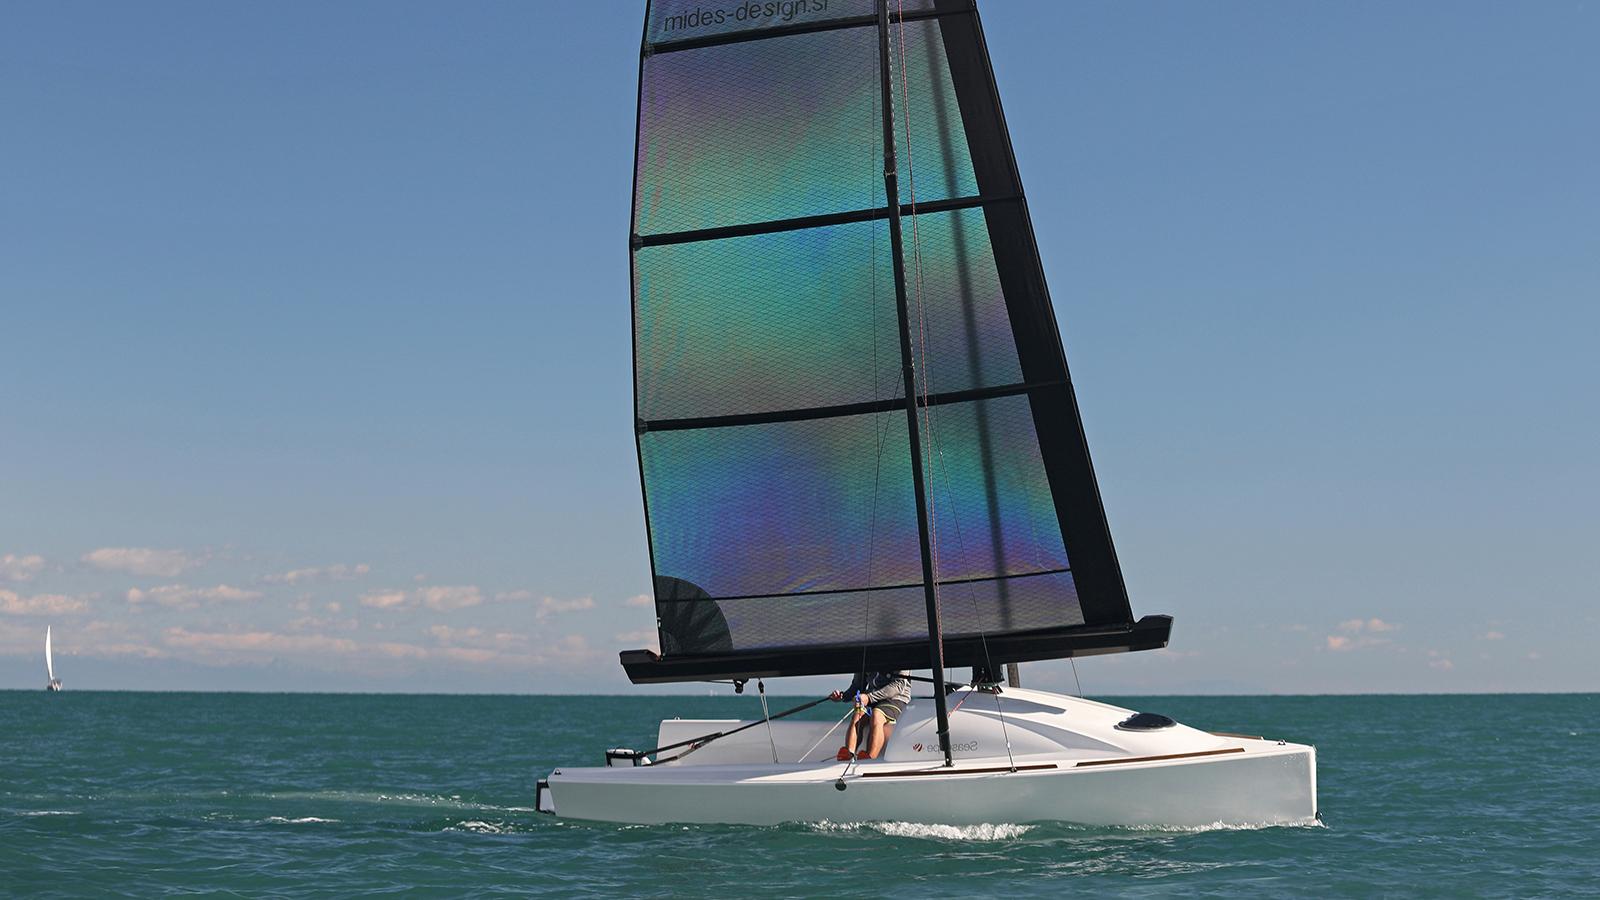 the-five-metre-aero-sail-prototype